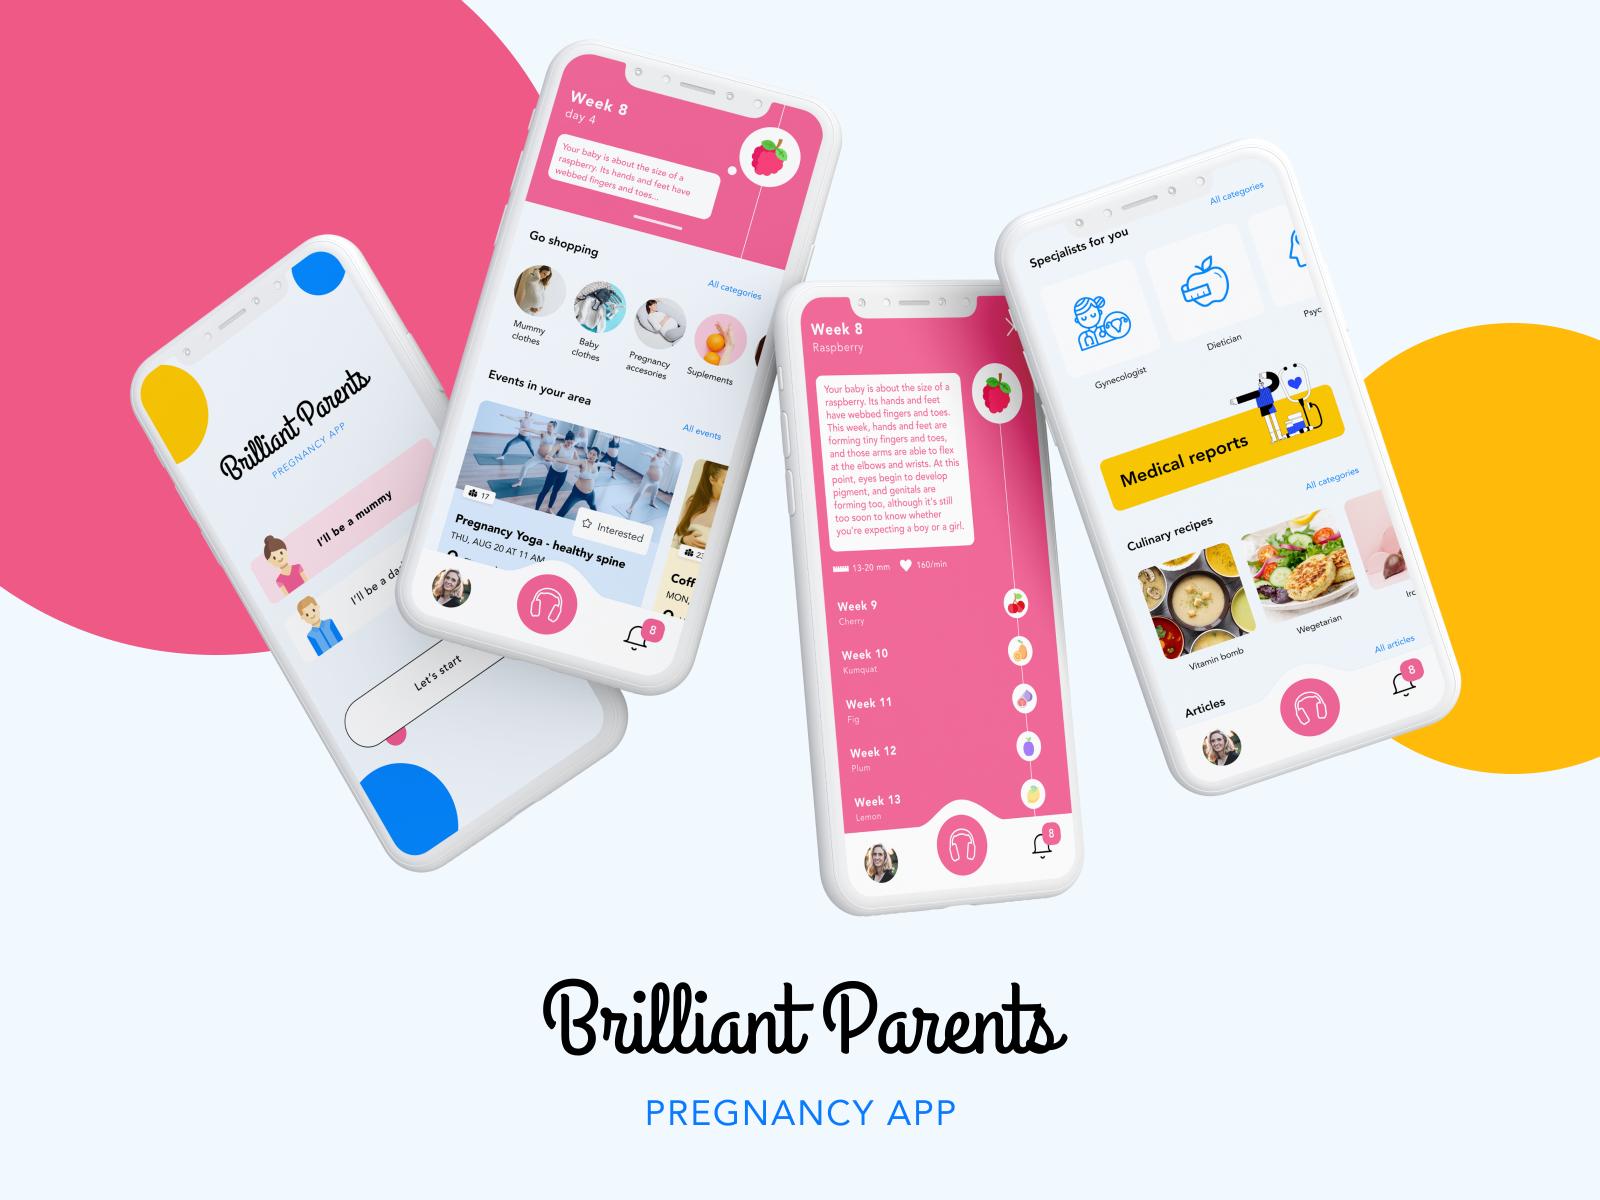 Brilliant Parents Pregnancy App By Alicja Urbanczyk For Divante On Dribbble